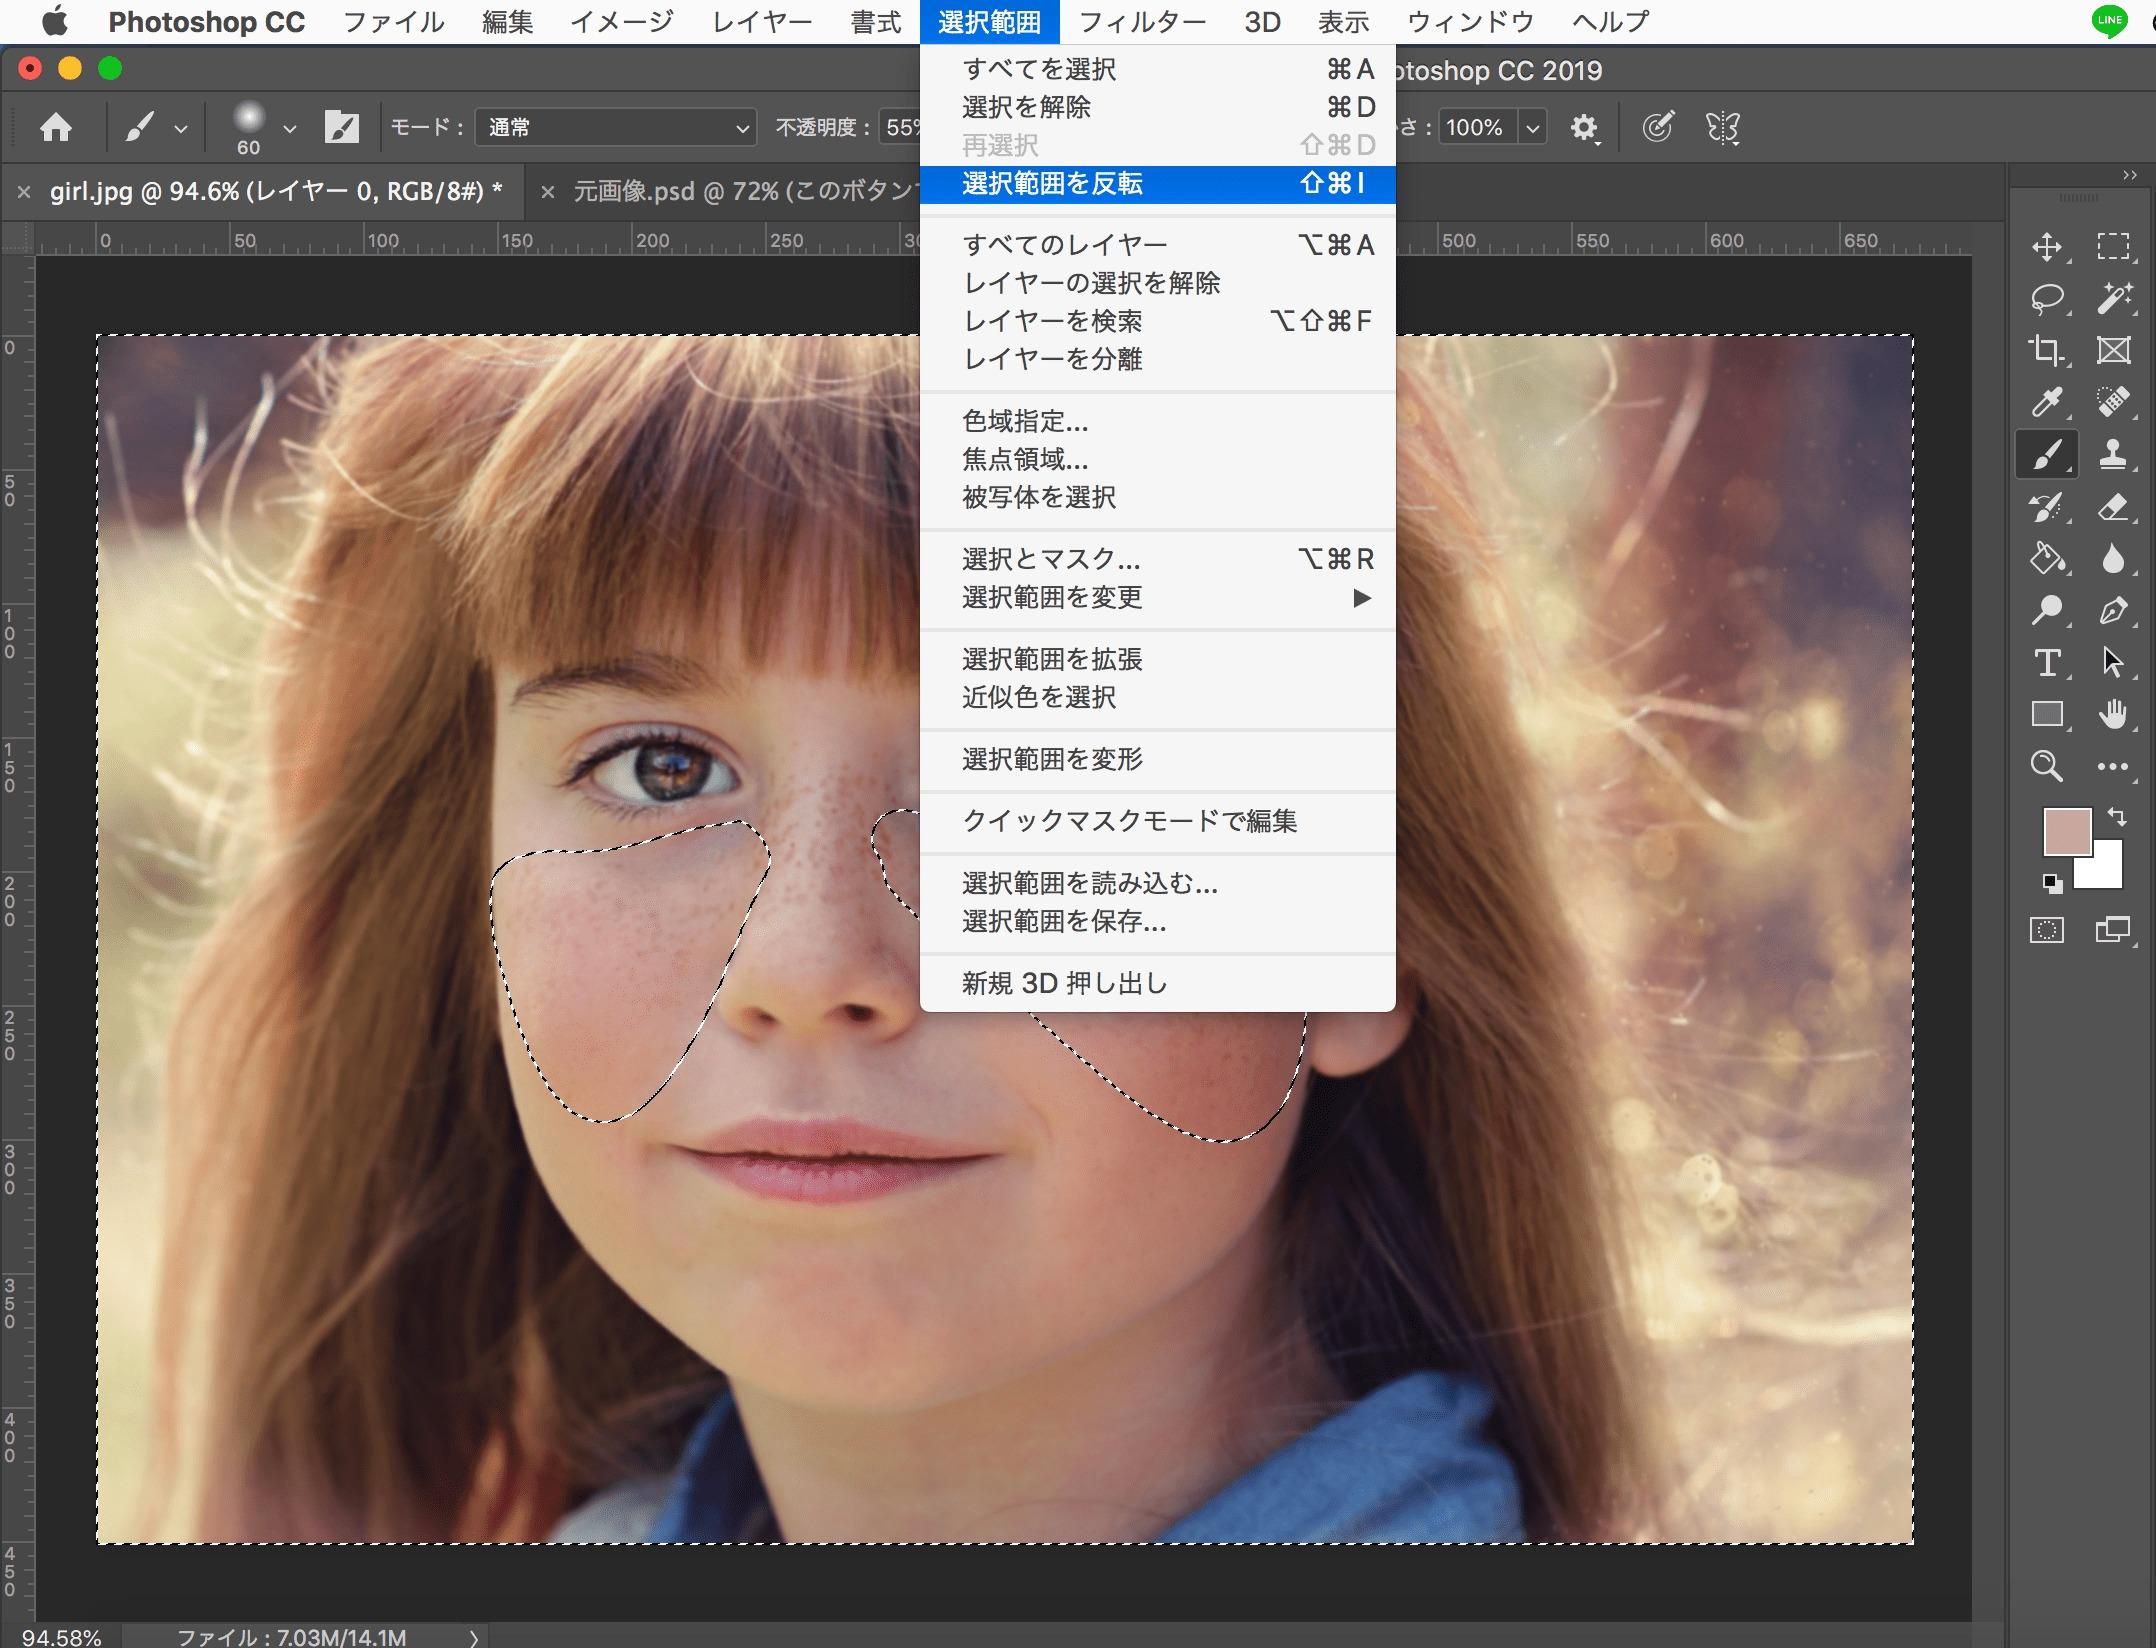 photoshopで人物の肌を加工する画像の選択範囲の反転